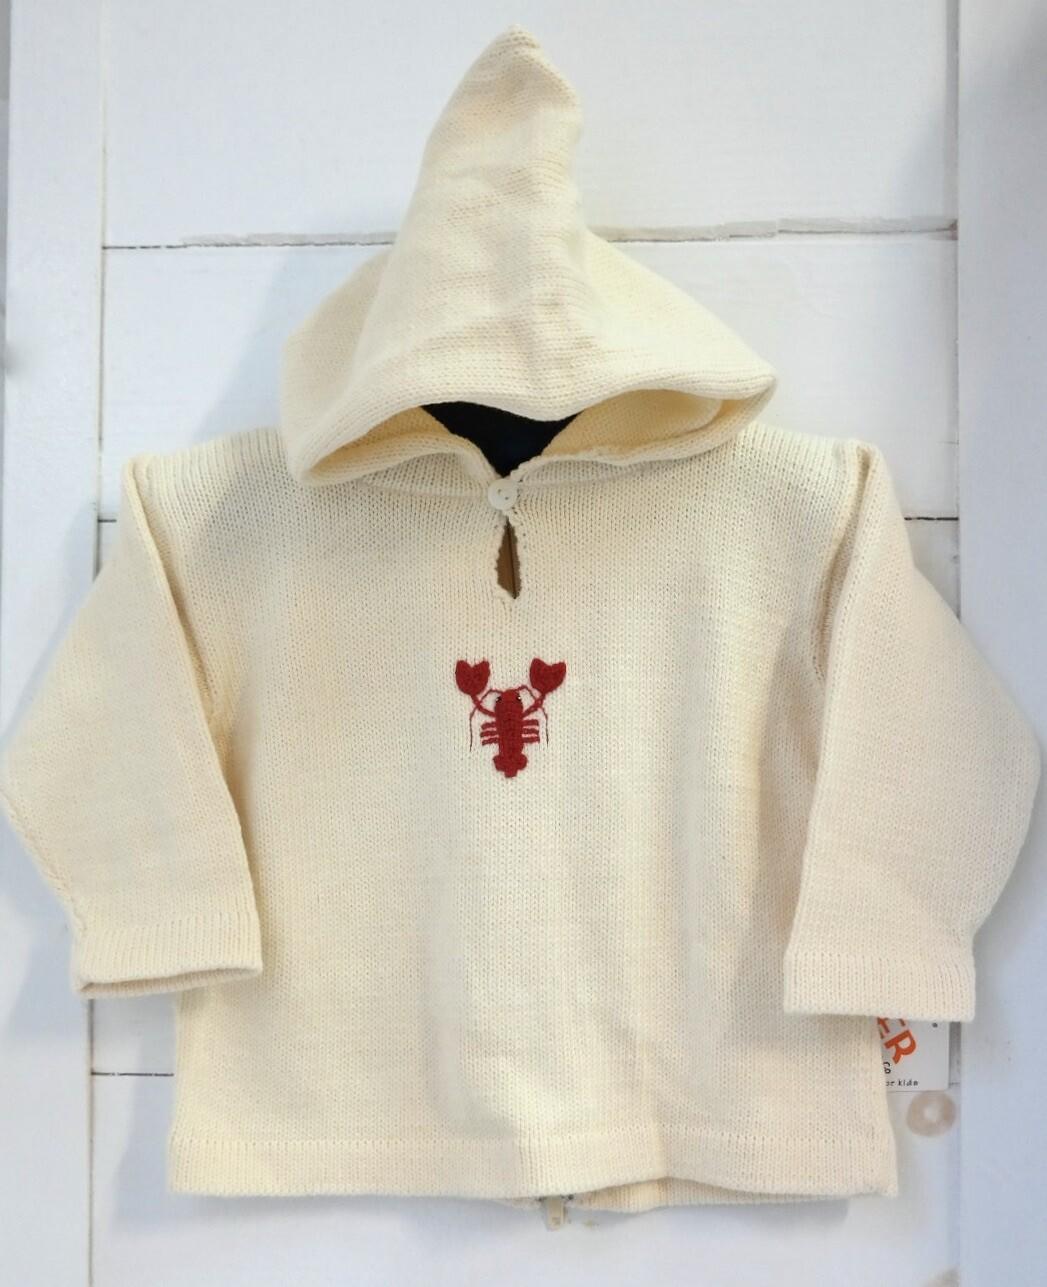 Claver Zip up hooded sweater - 12 mos ecru cotton